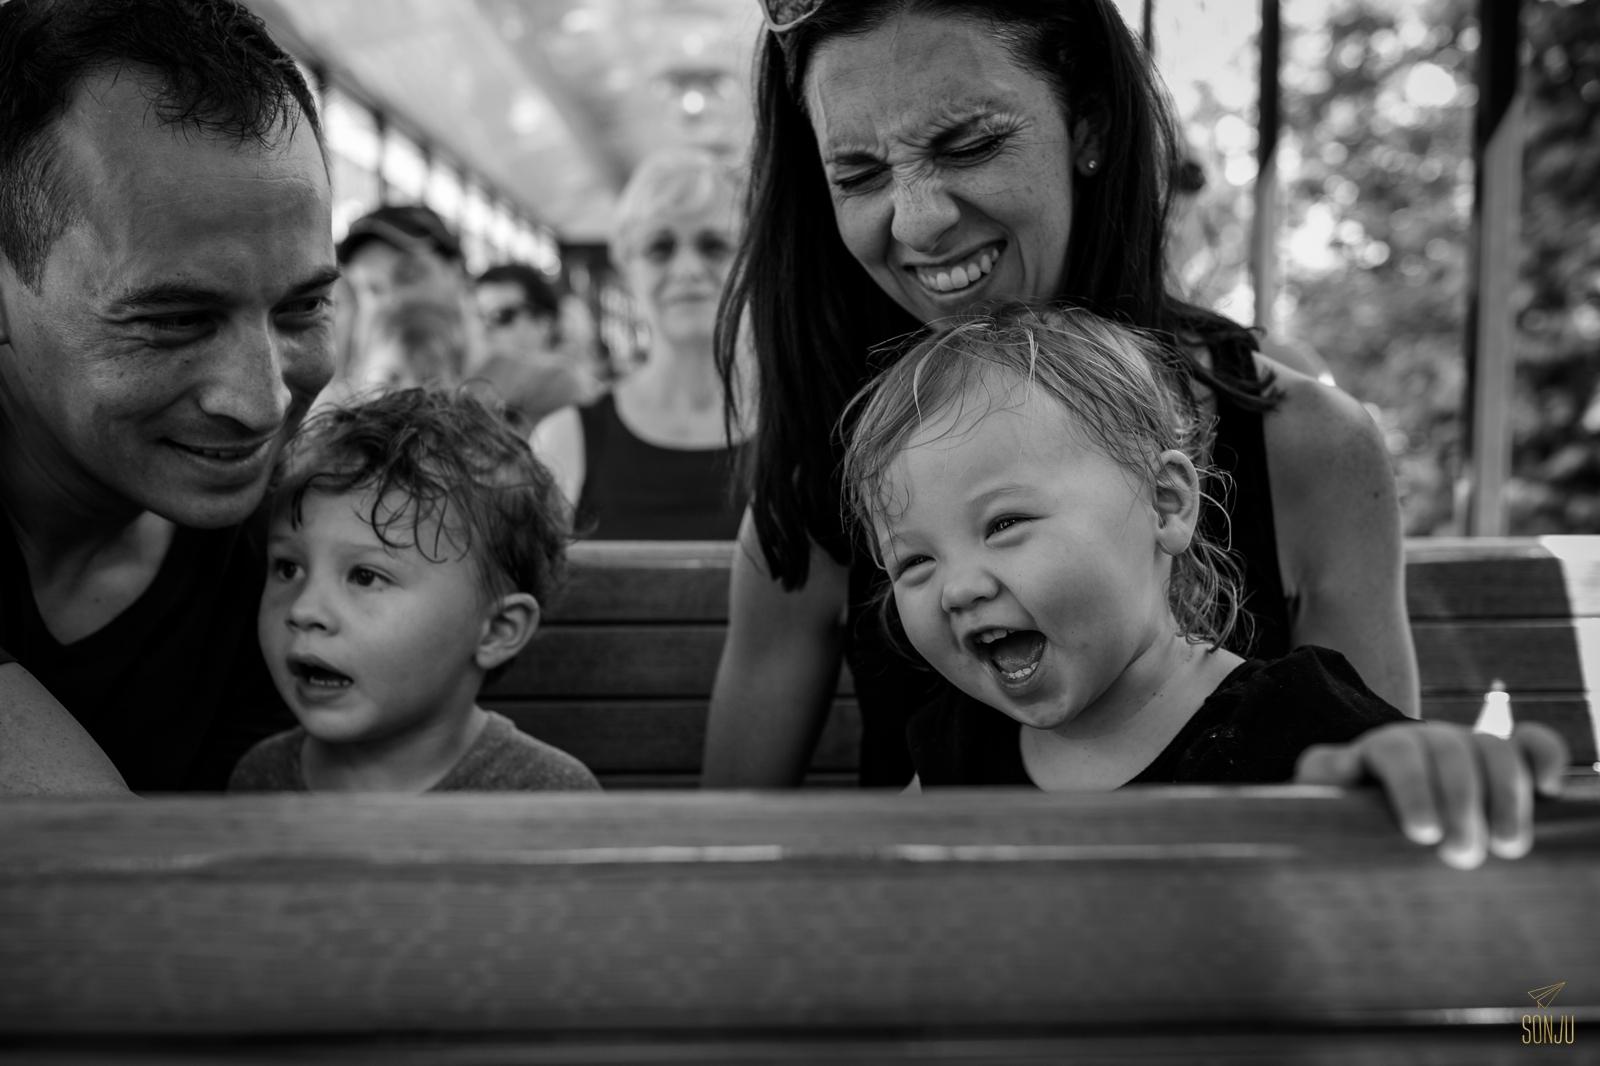 florida-family-photography-at-central-florida-theme-park